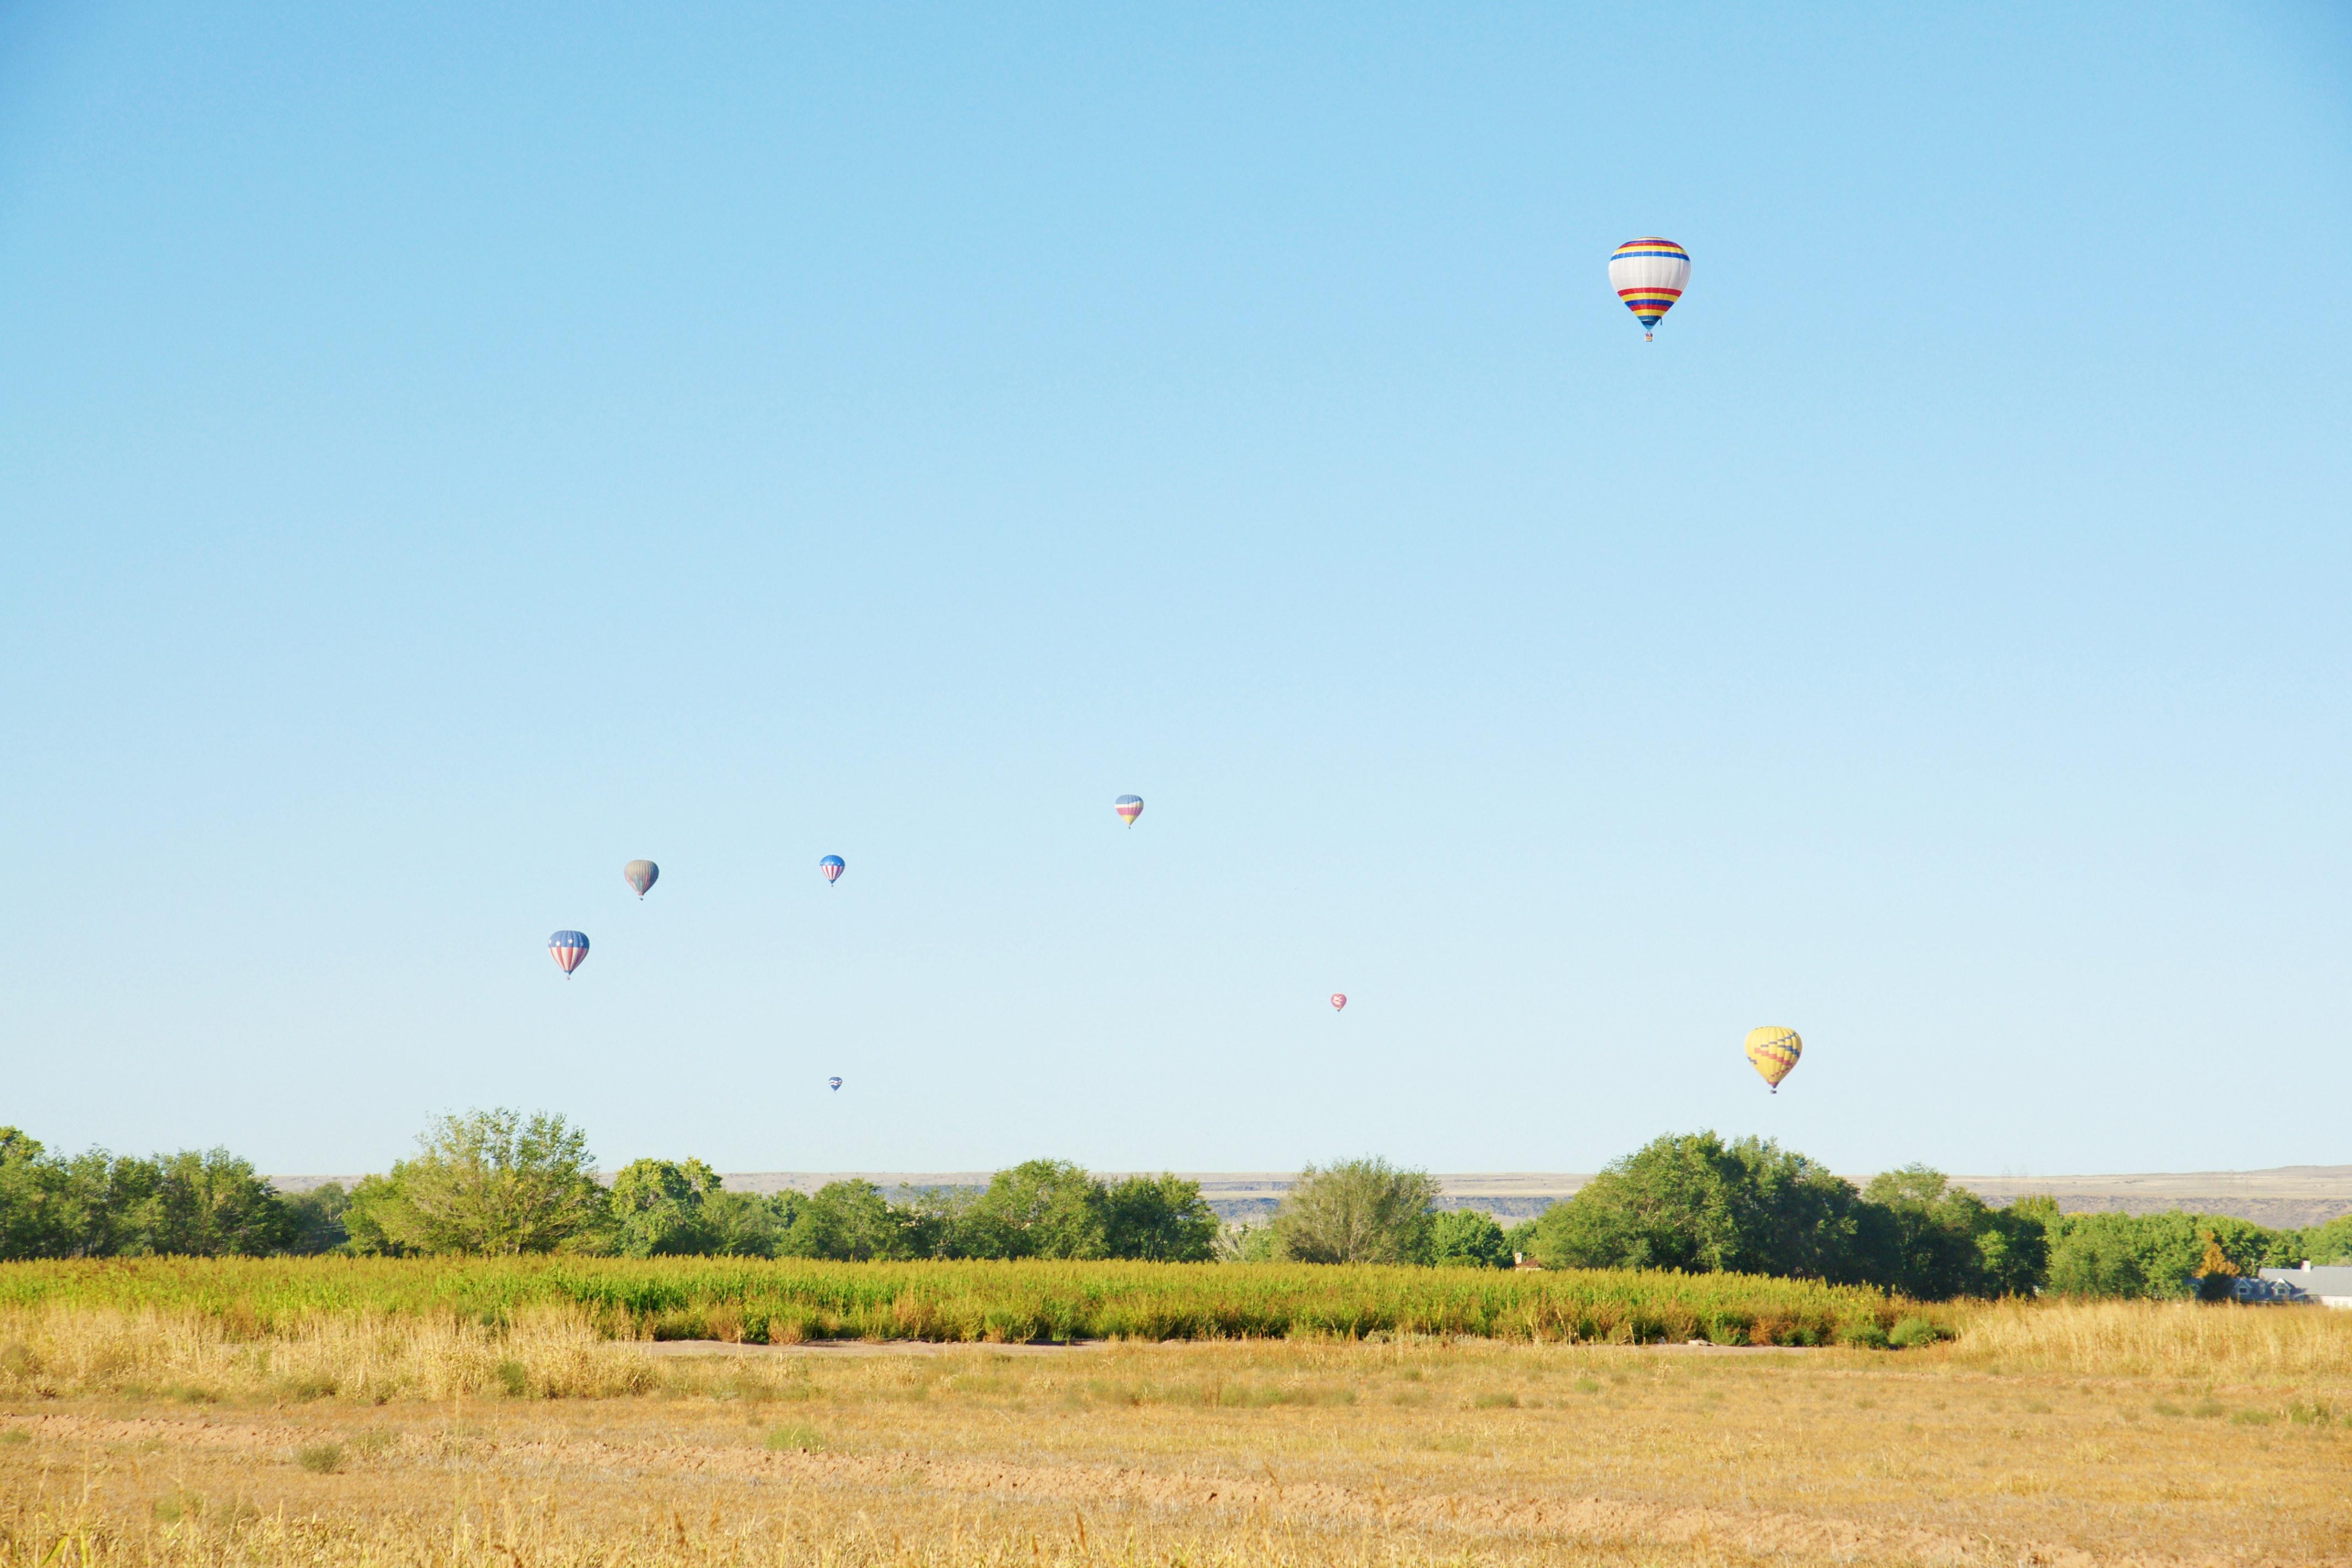 aibf-Balloon-Descent-Gallery07